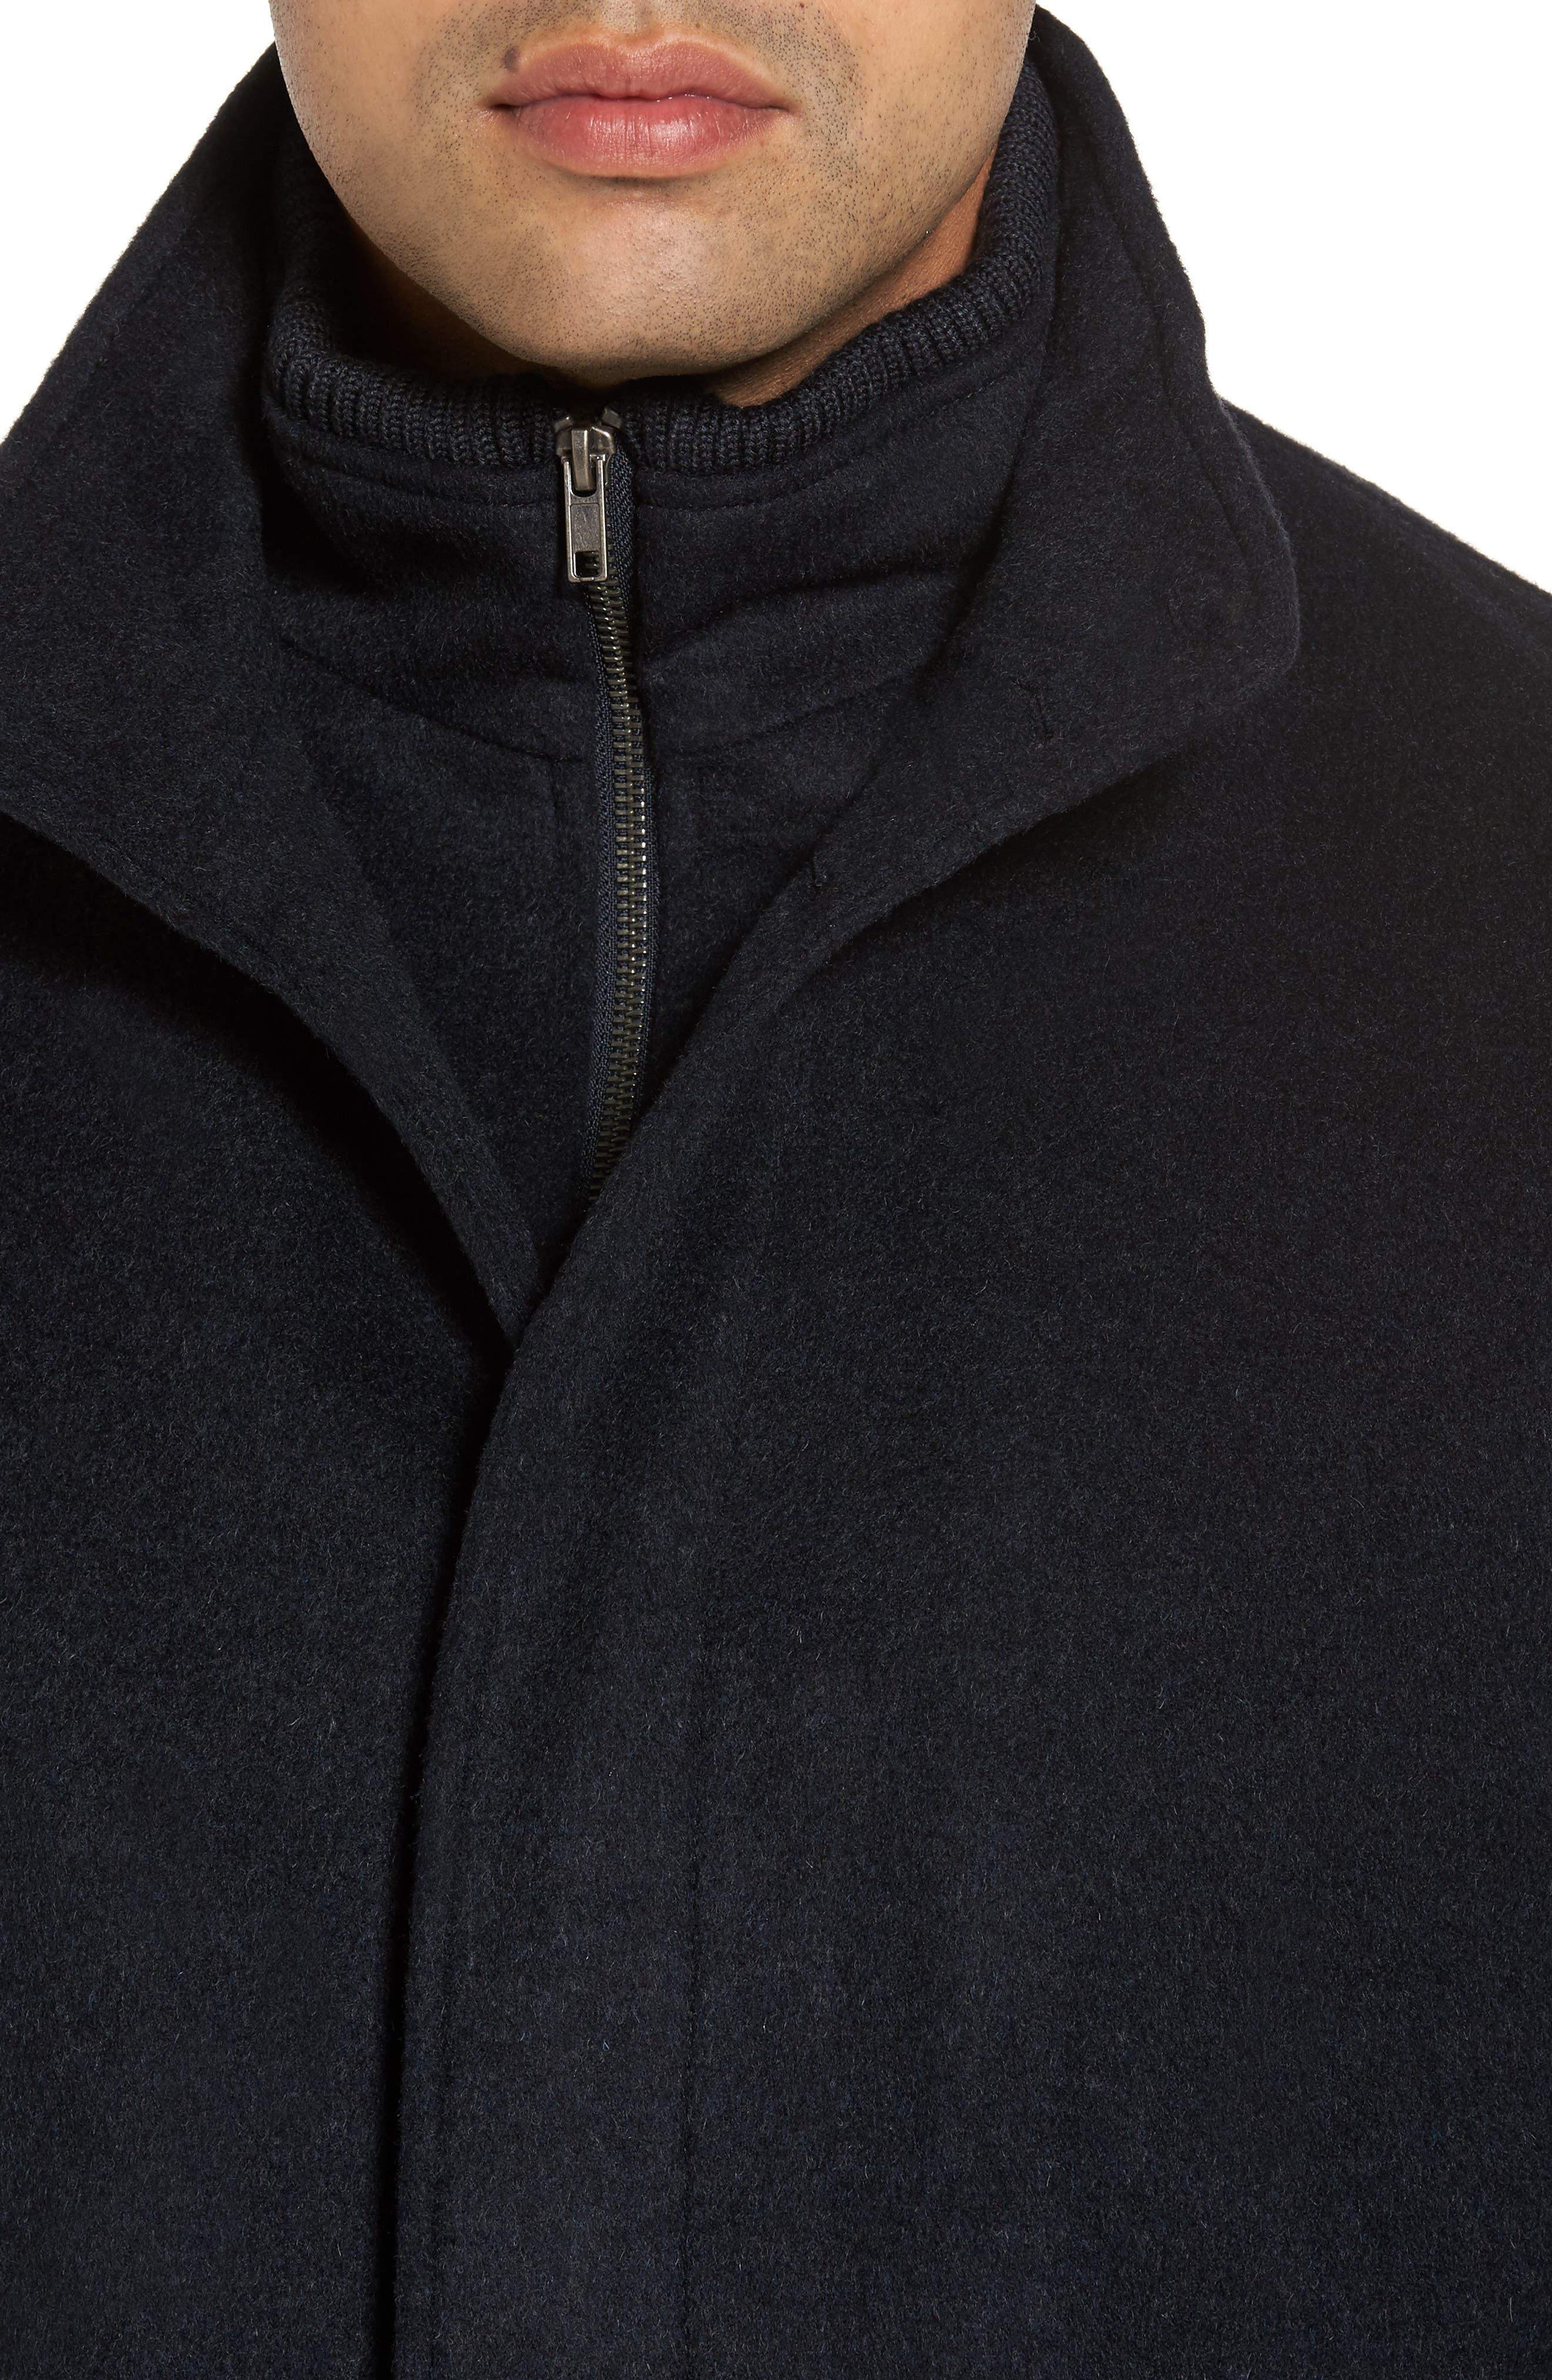 Alternate Image 4  - Cardinal of Canada Wool Jacket